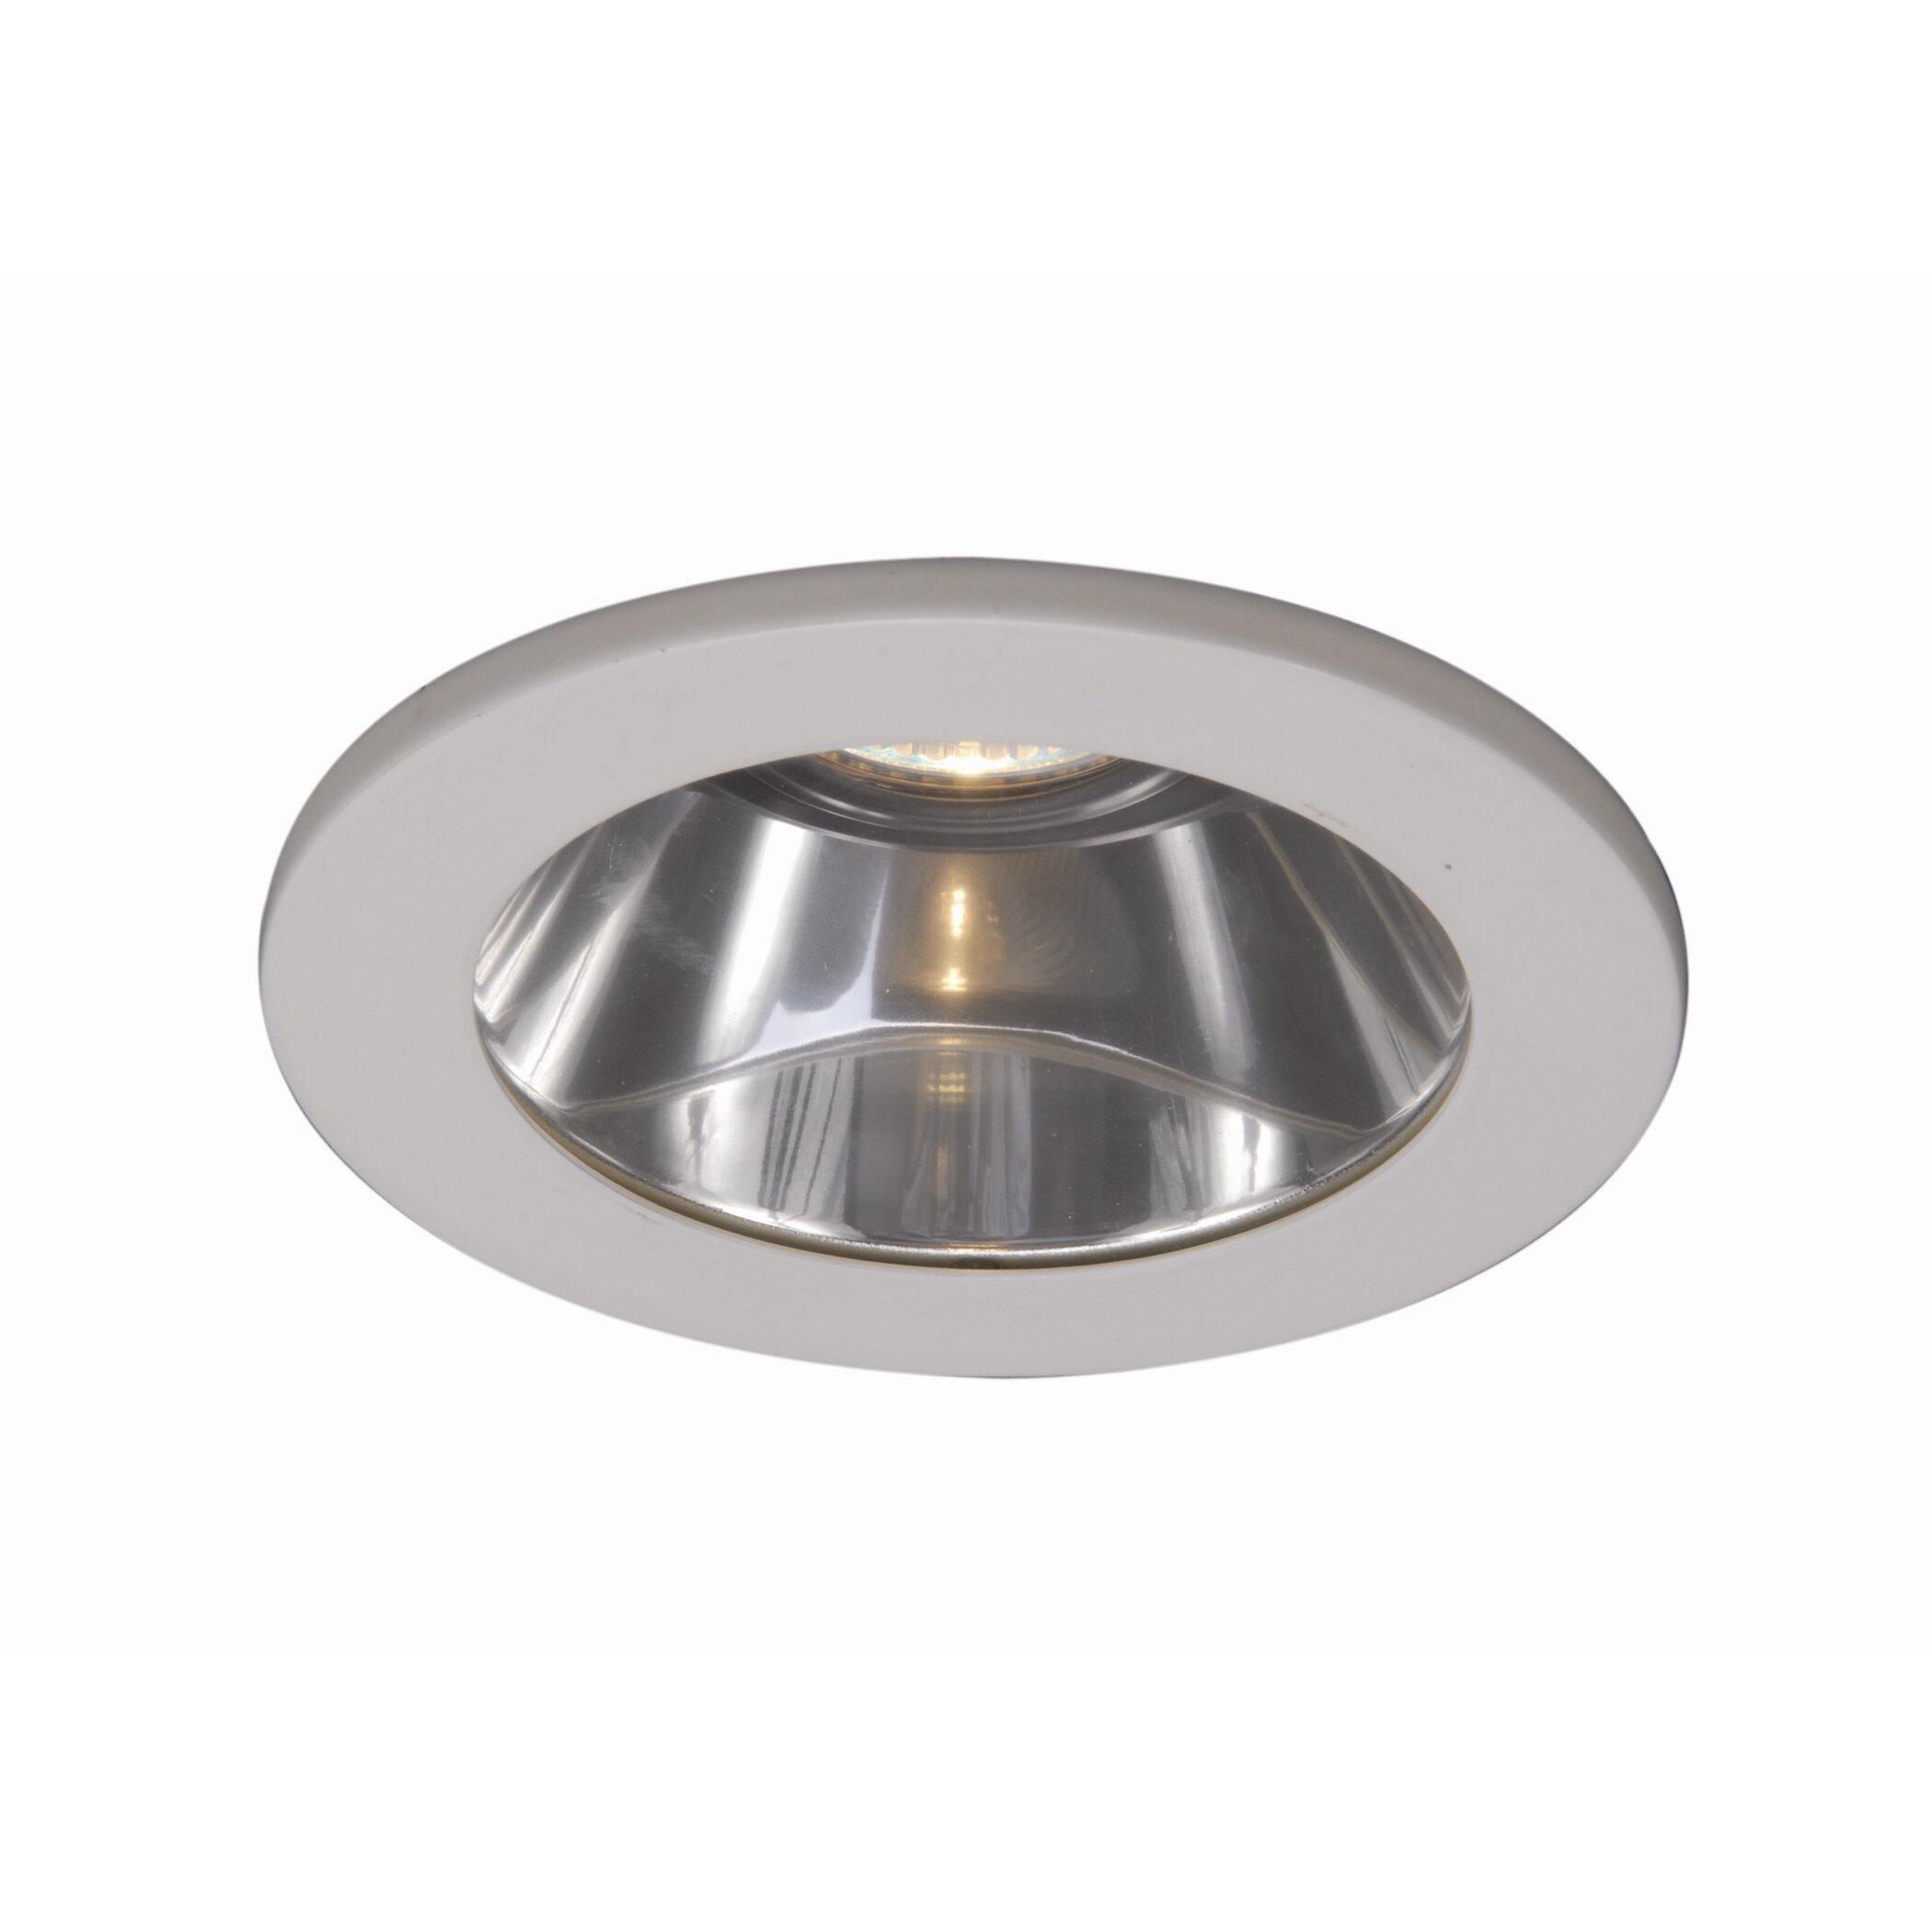 flat glass shower light recessed trim by wac lighting. Black Bedroom Furniture Sets. Home Design Ideas